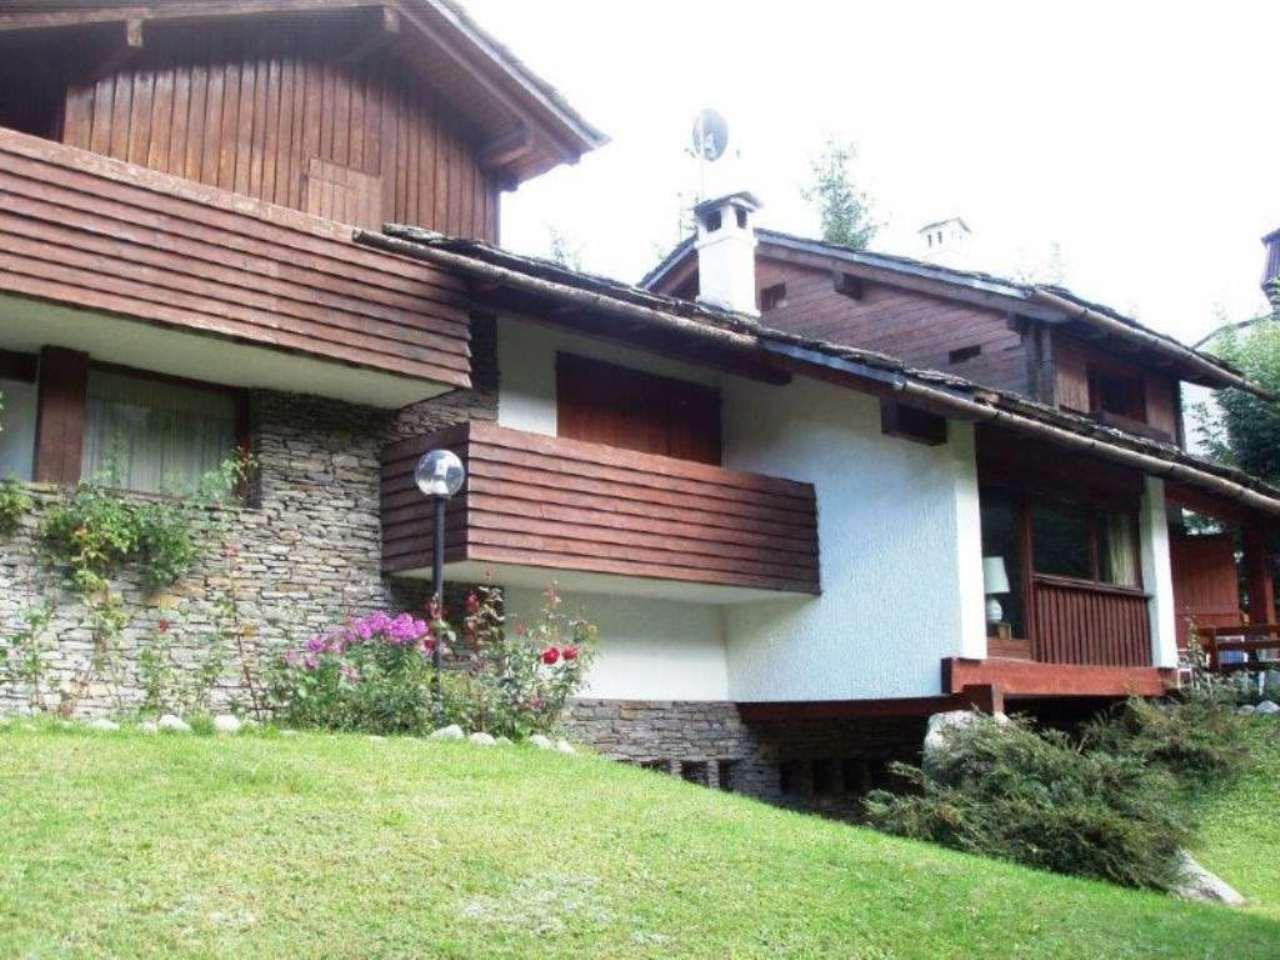 Villa in Vendita a Courmayeur: 5 locali, 220 mq - Foto 3